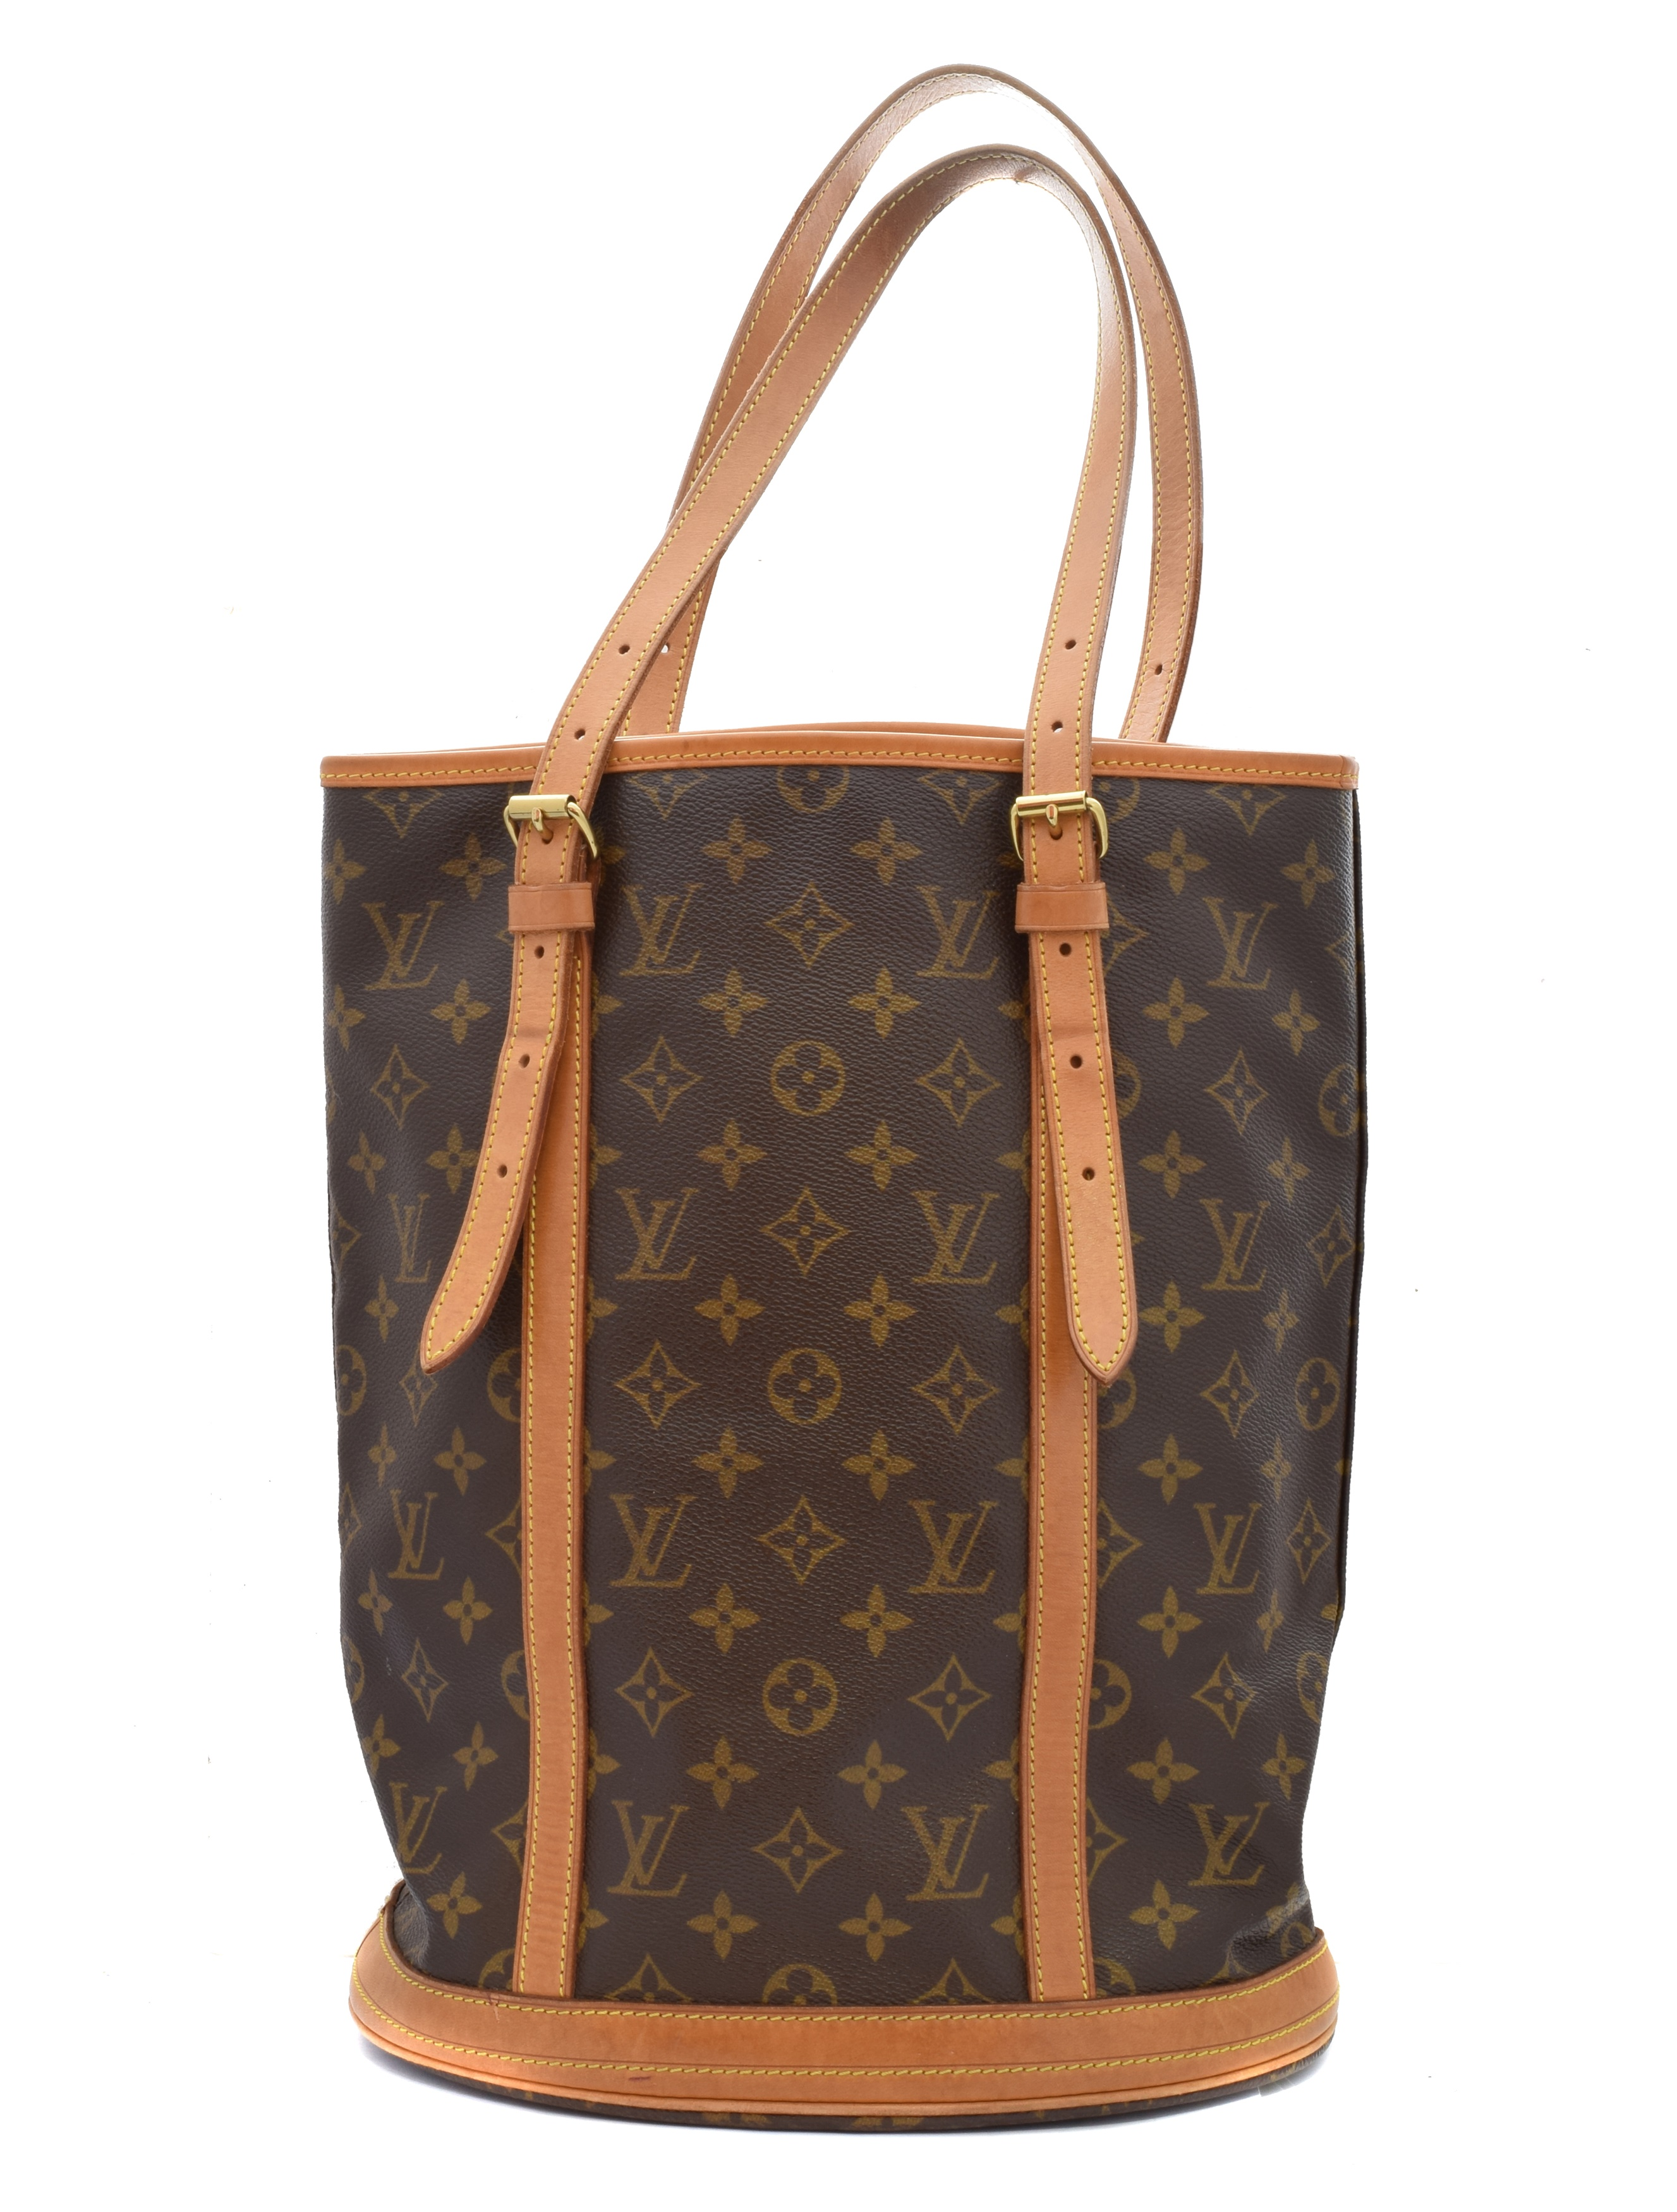 A Louis Vuitton Monogram Bucket Shoulder Bag,